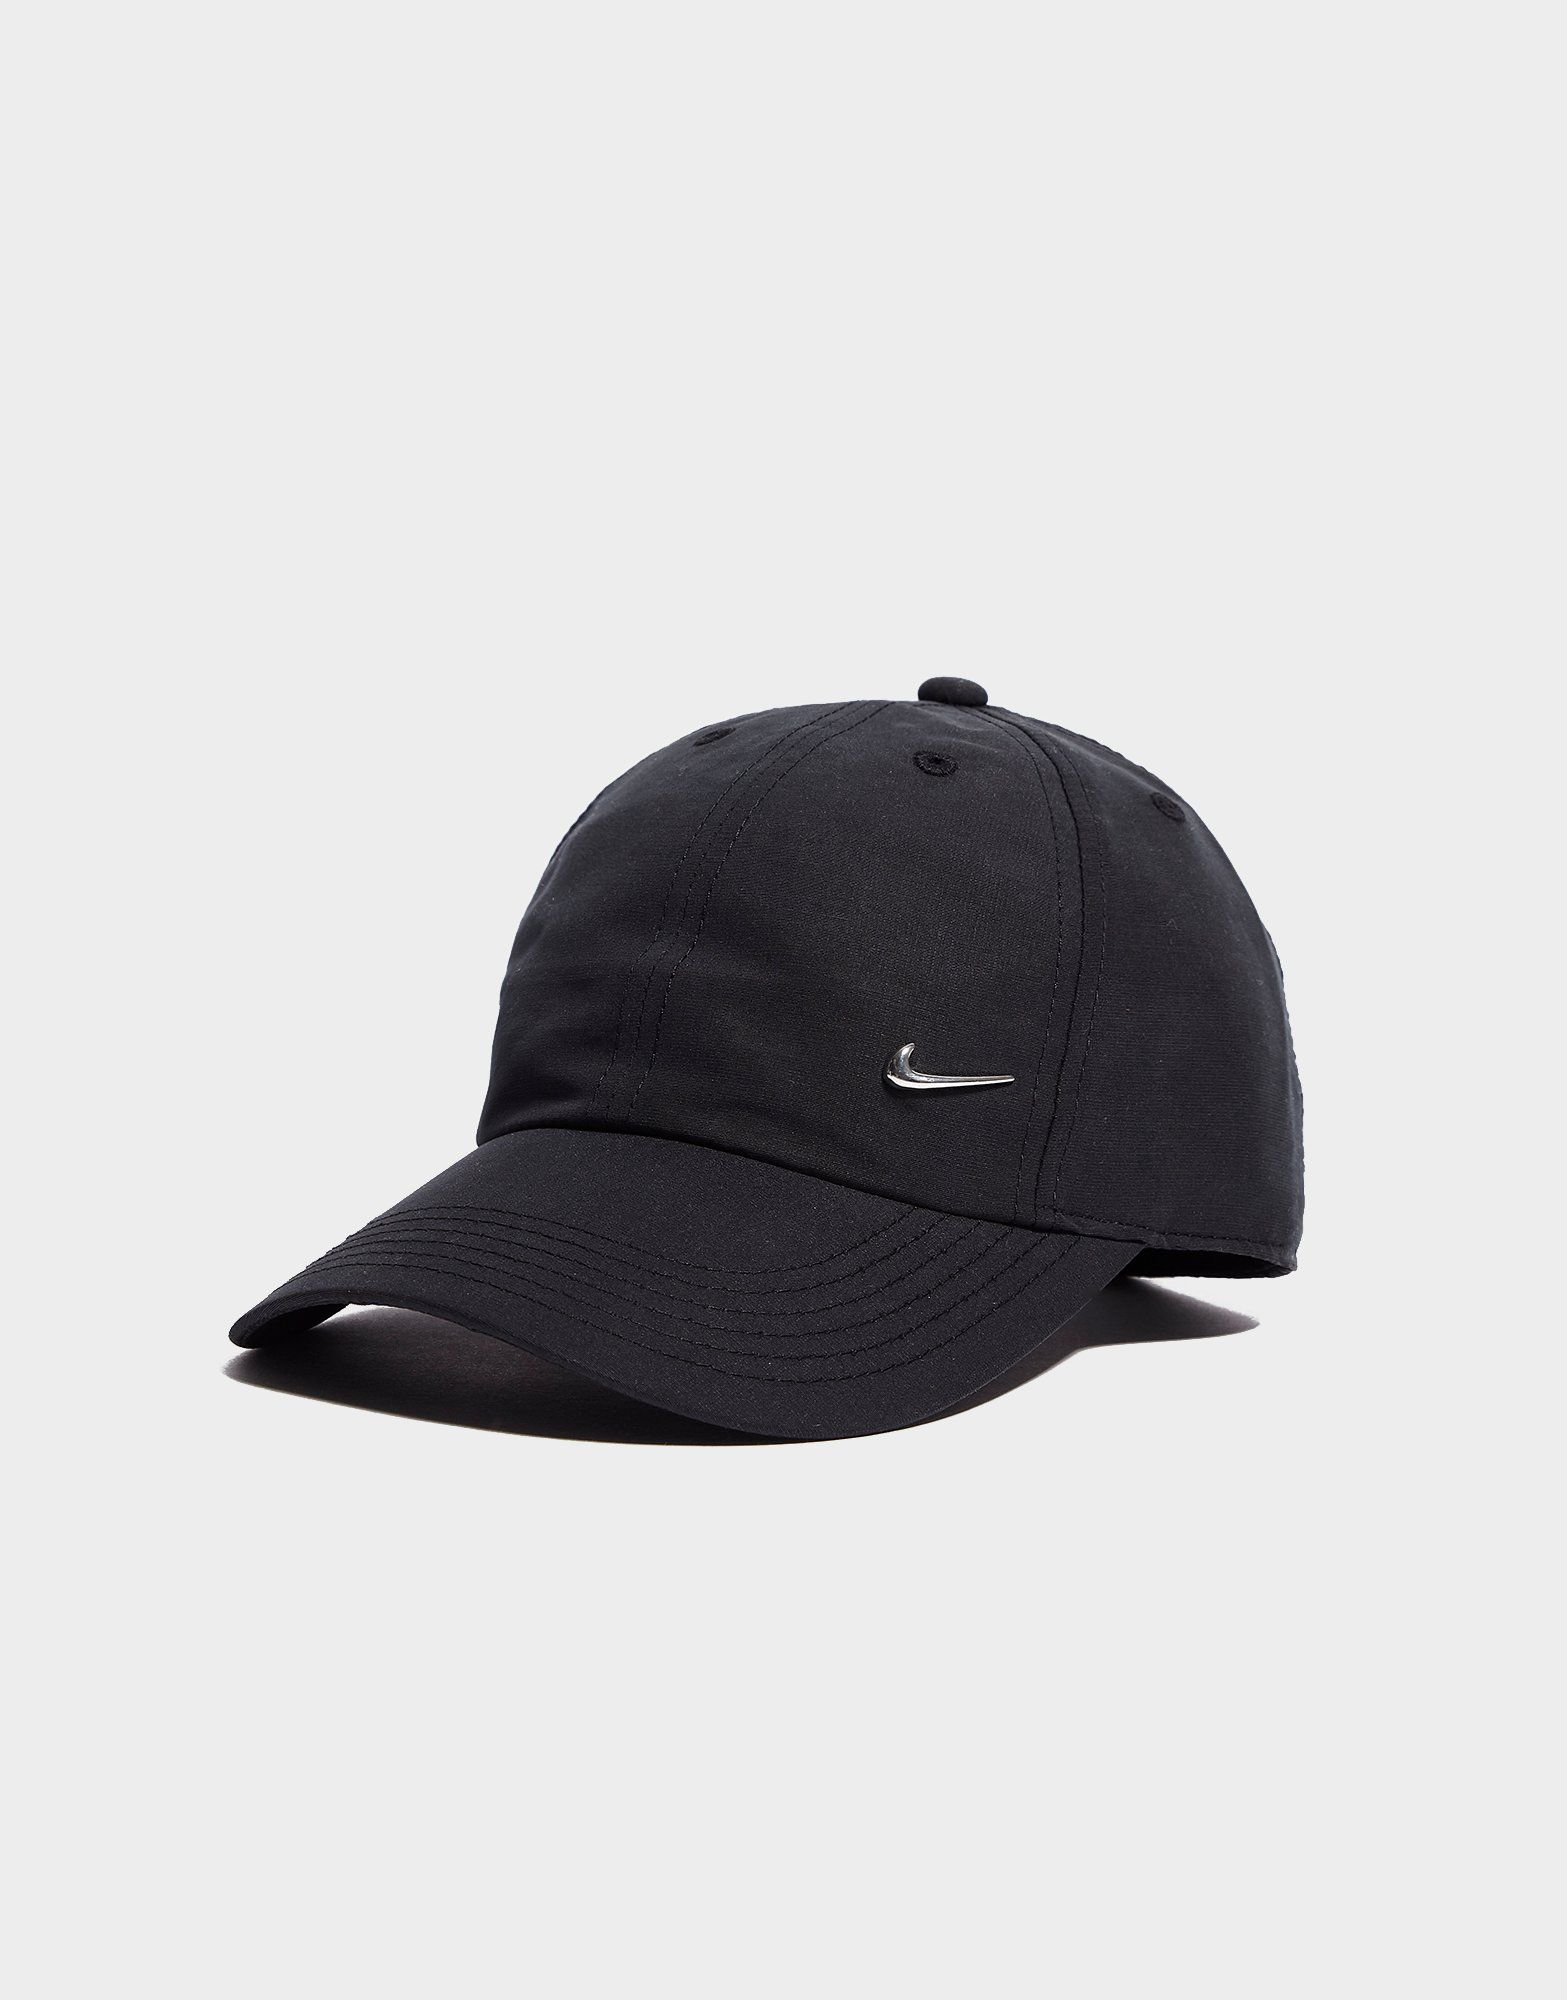 Nike gorra Side Swoosh júnior